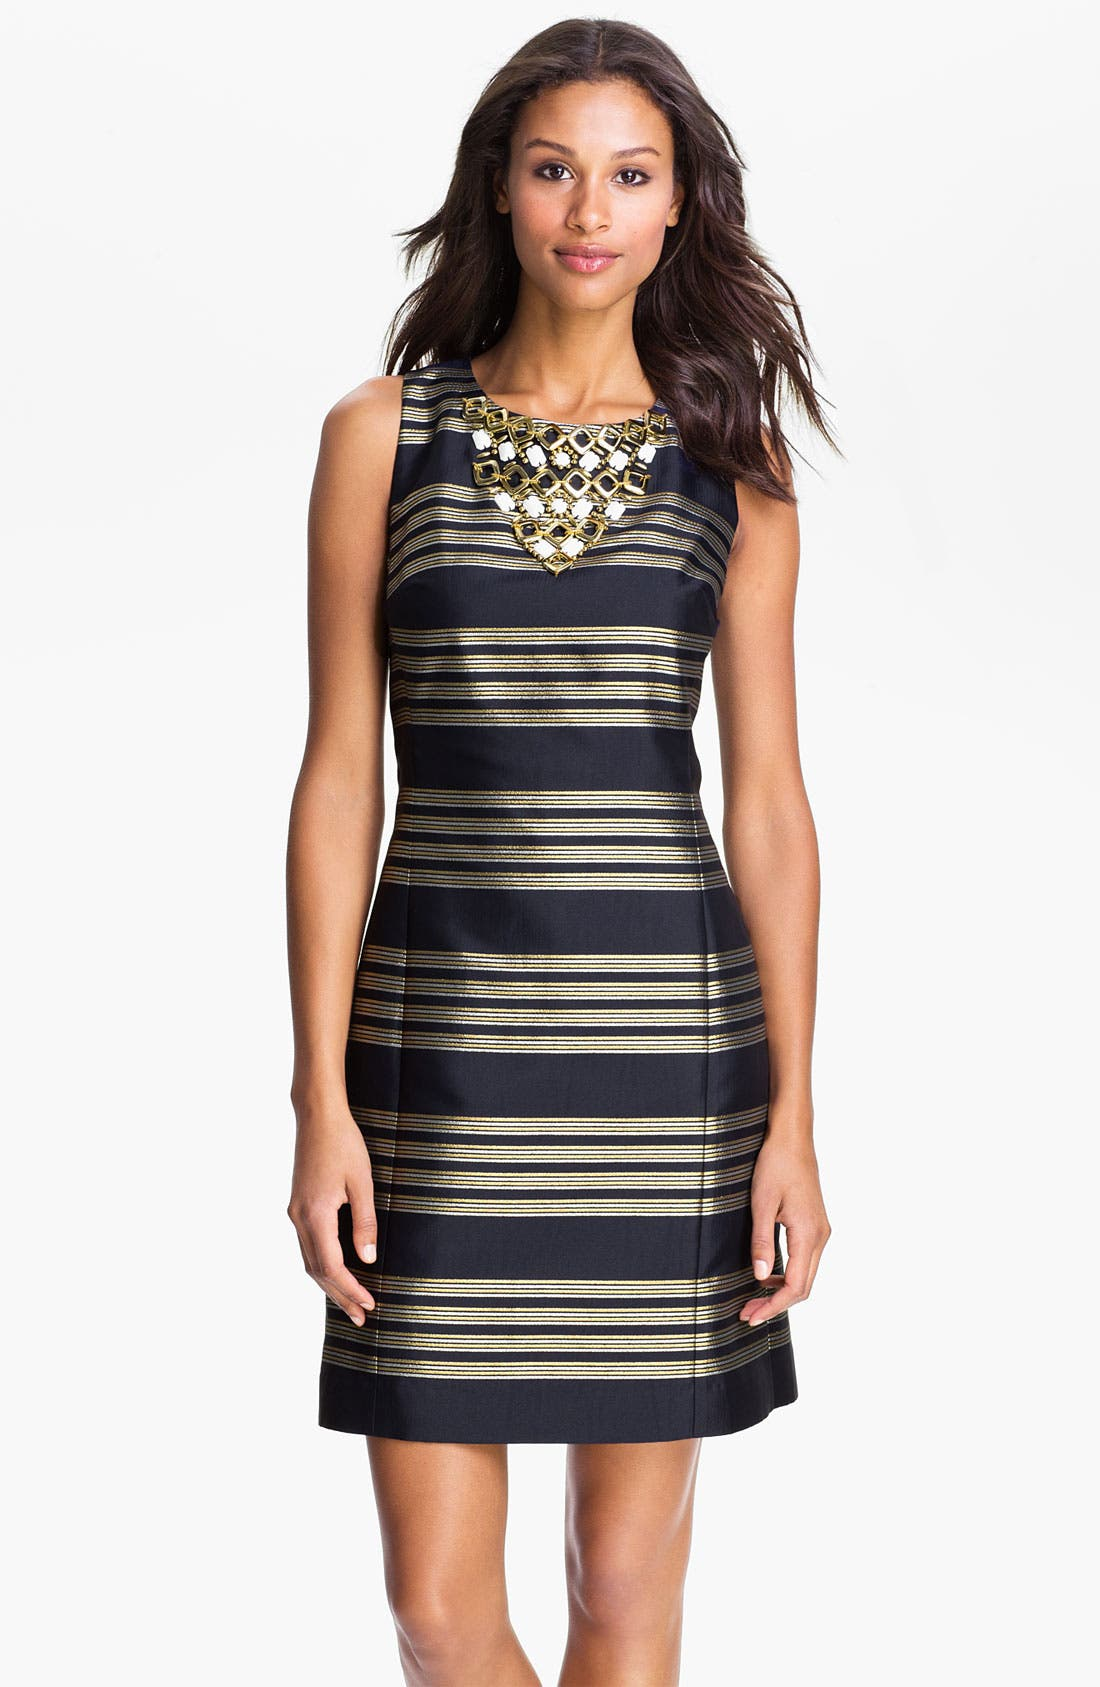 Alternate Image 1 Selected - Lilly Pulitzer® Beaded Neck Metallic Stripe Sheath Dress